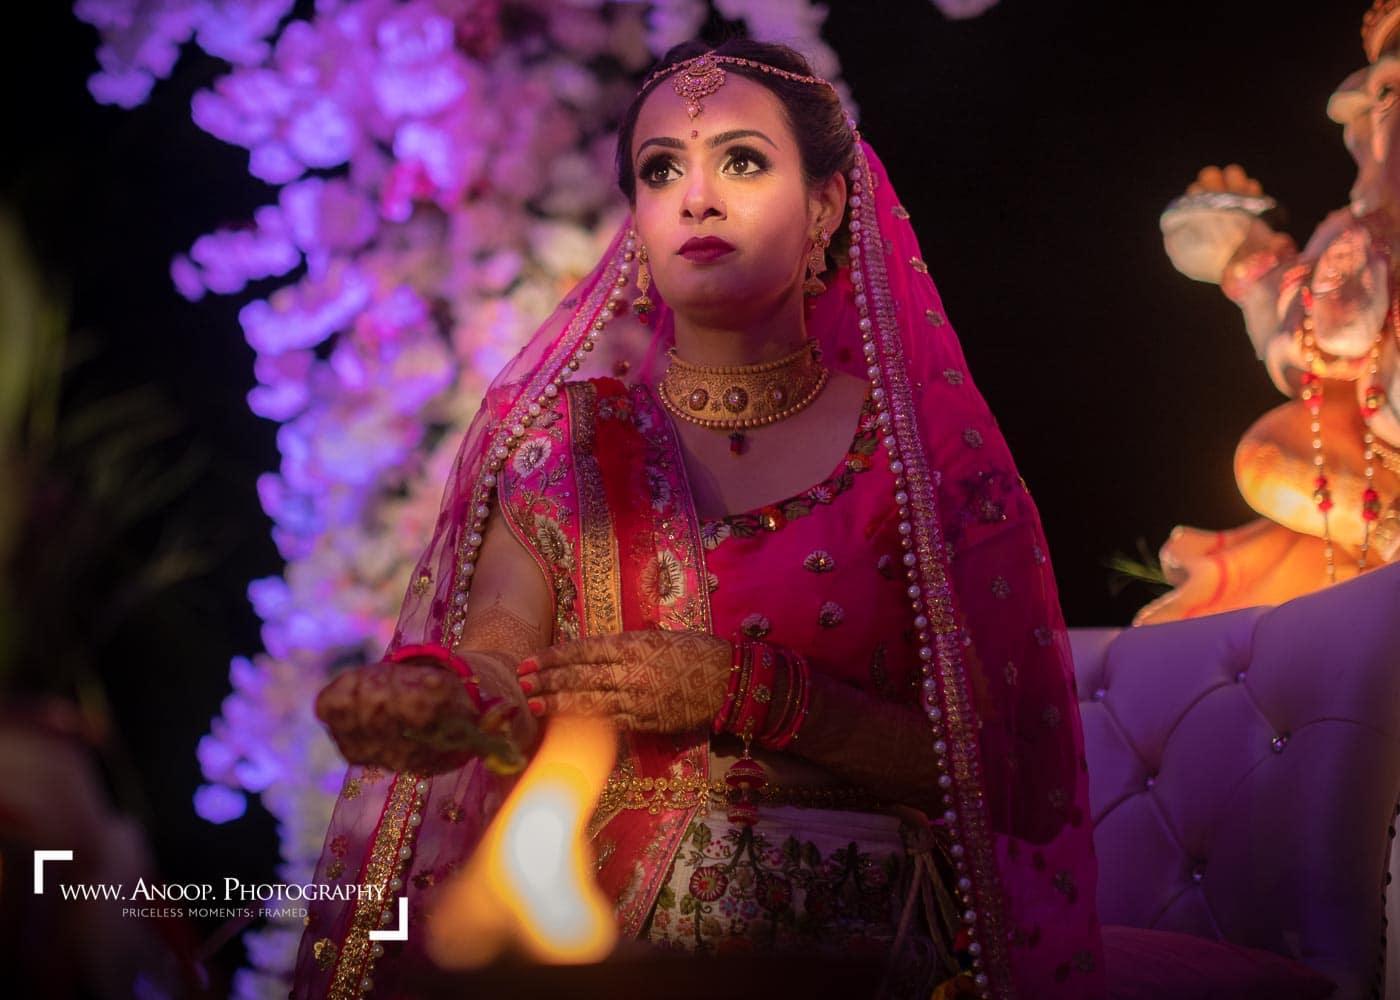 Destination-Nepali-Wedding-in-thailand-sheraton-hua-hin-016